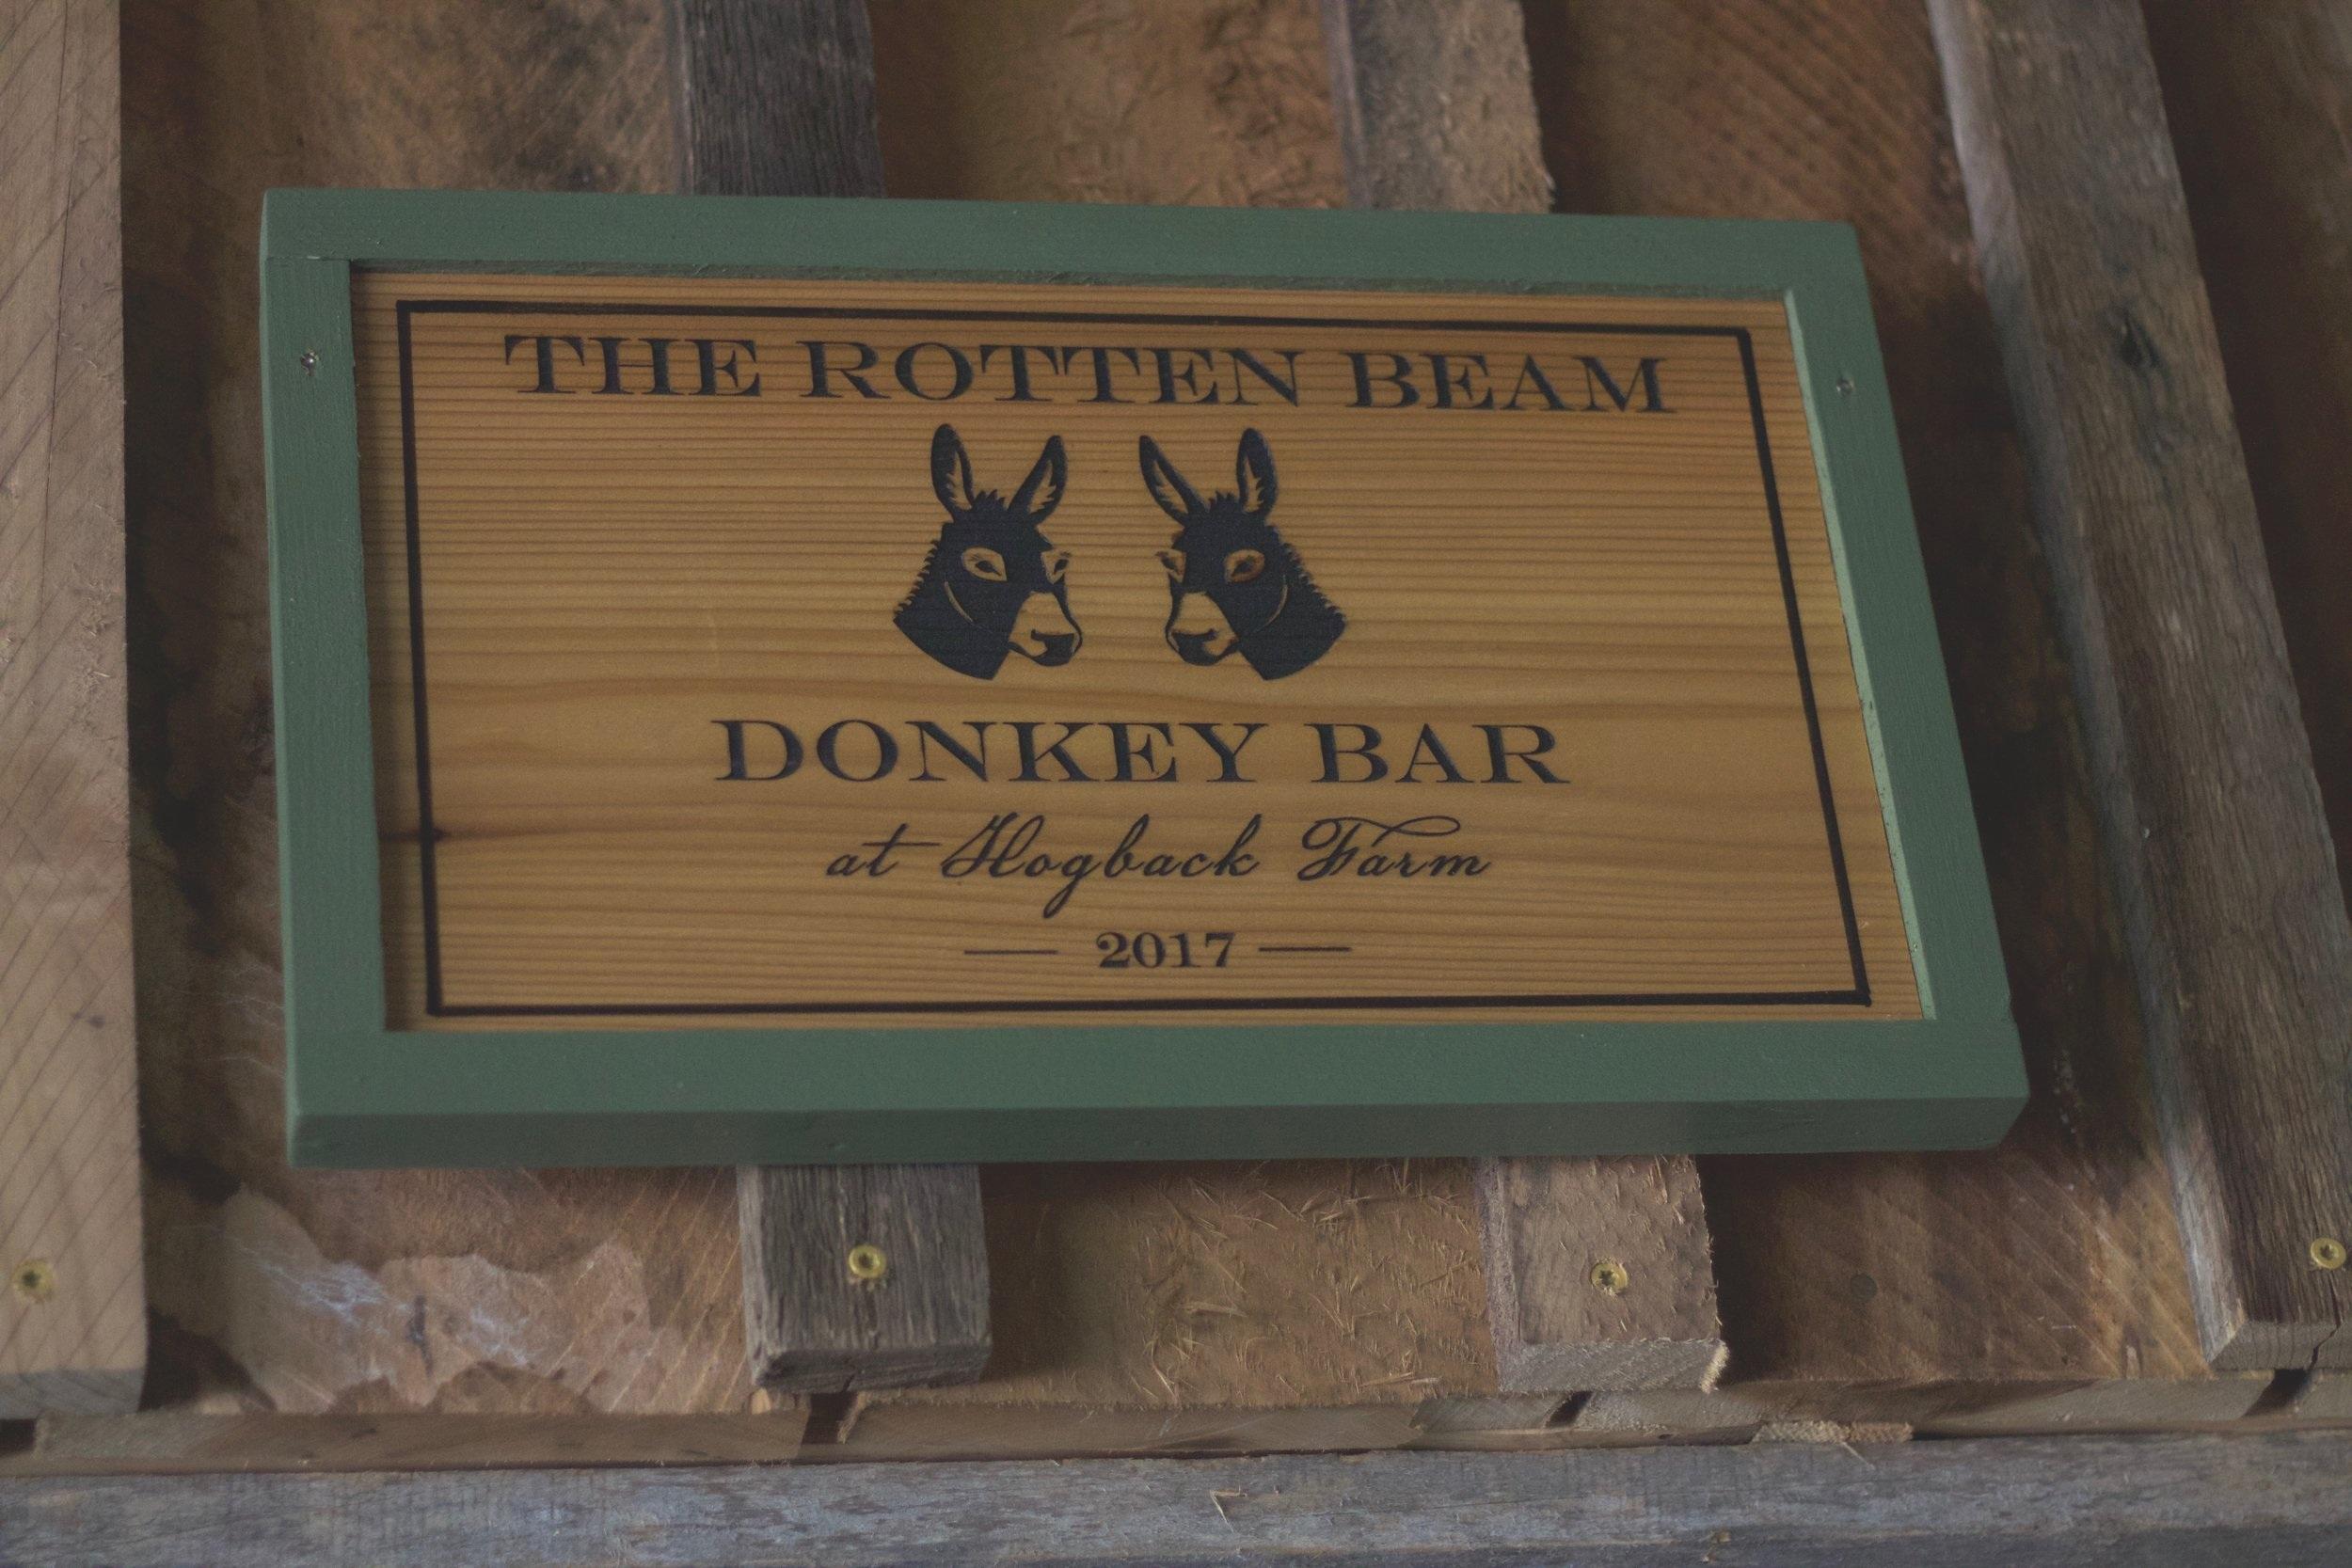 donkey bar.jpg